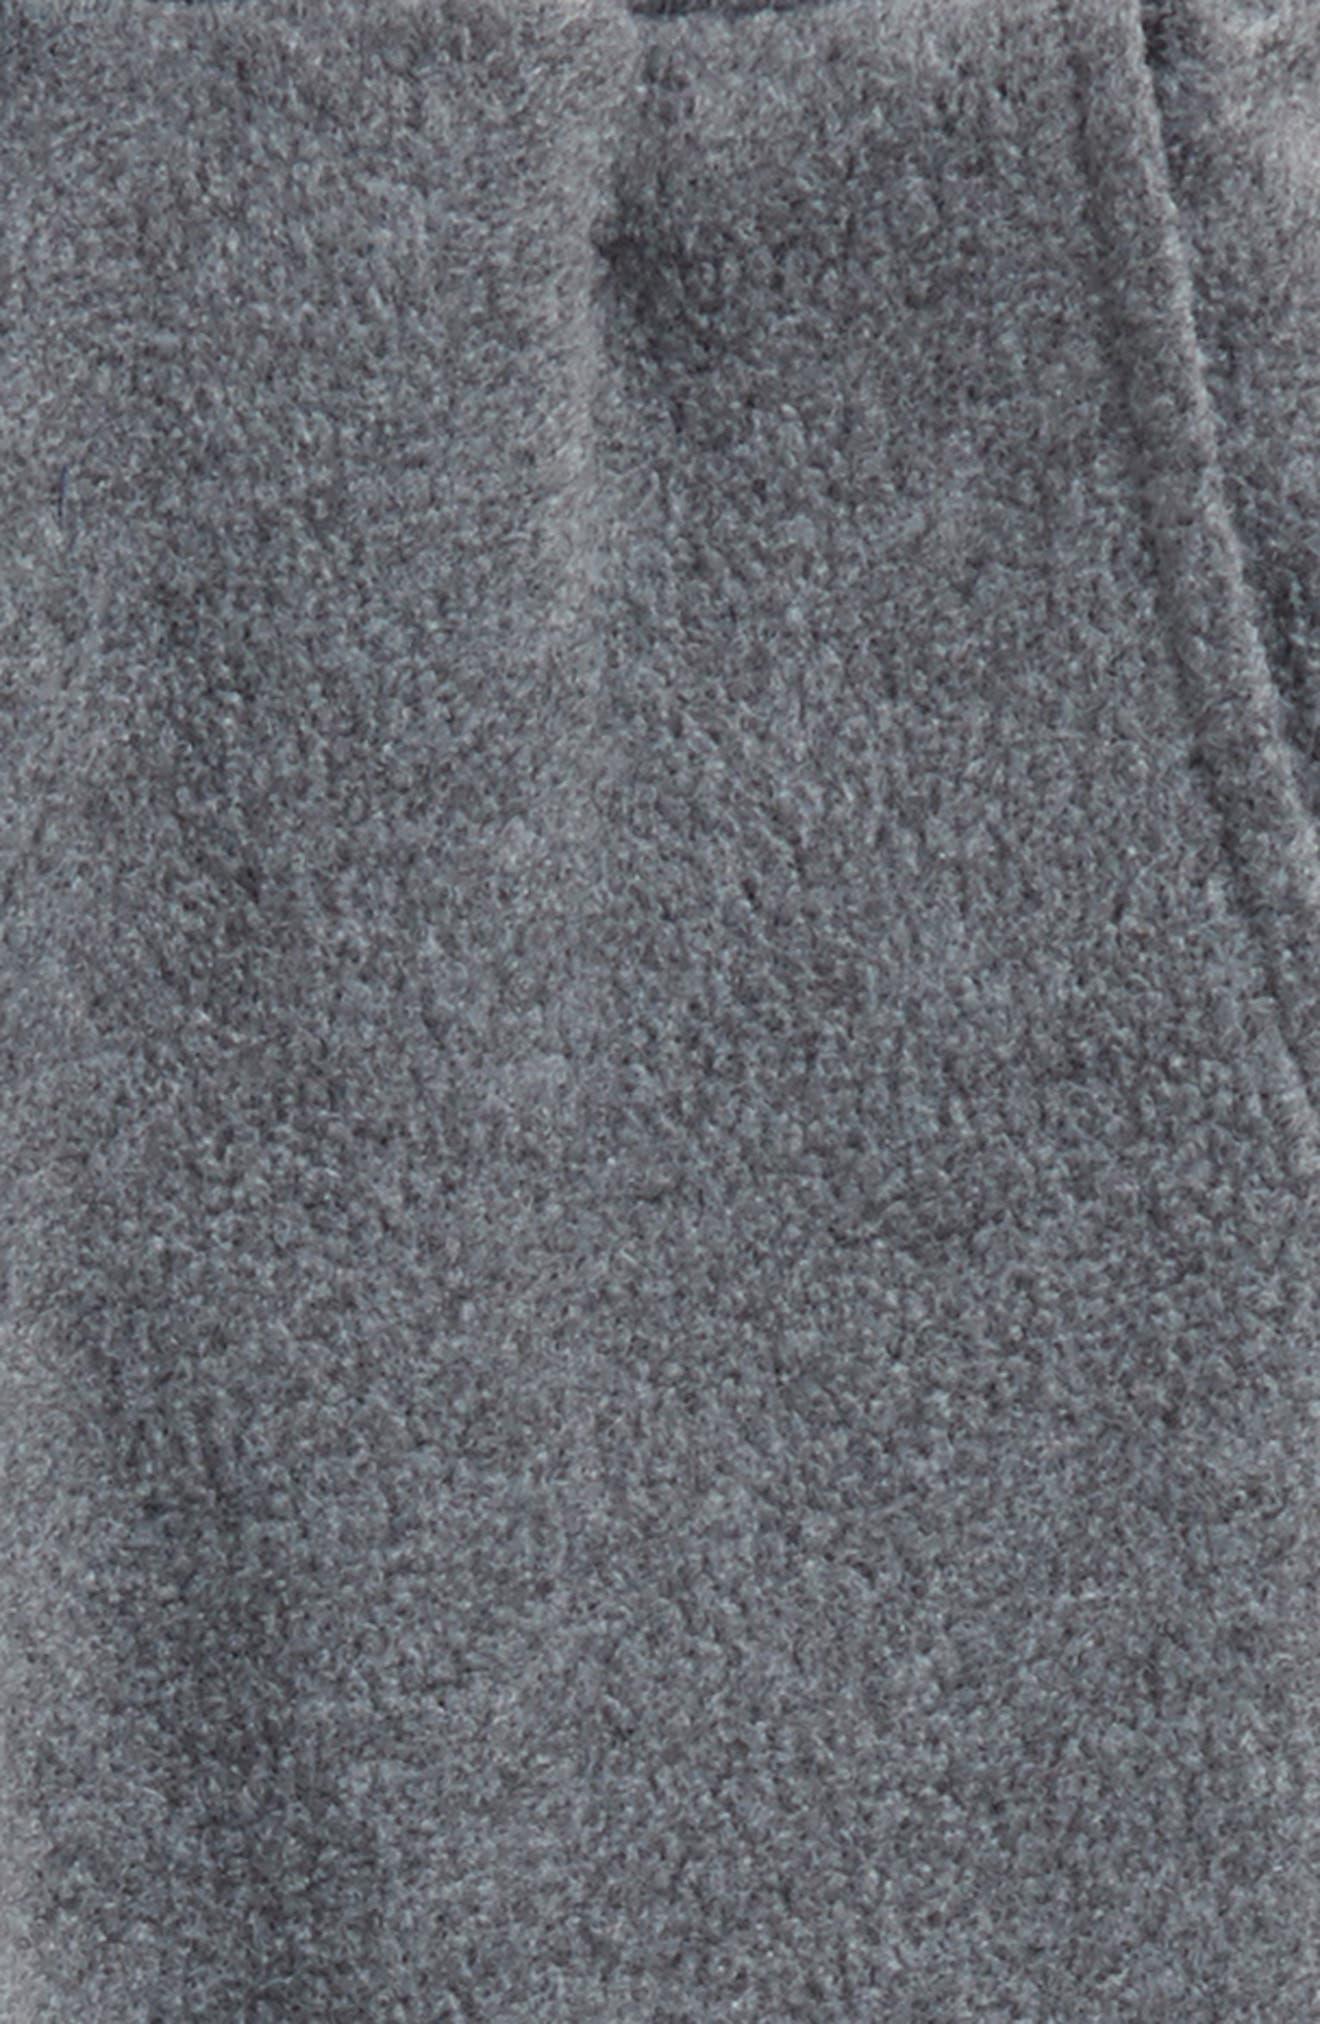 Alternate Image 2  - Mini Boden Microfleece Jogger Pants (Toddler Boys, Little Boys & Big Boys)